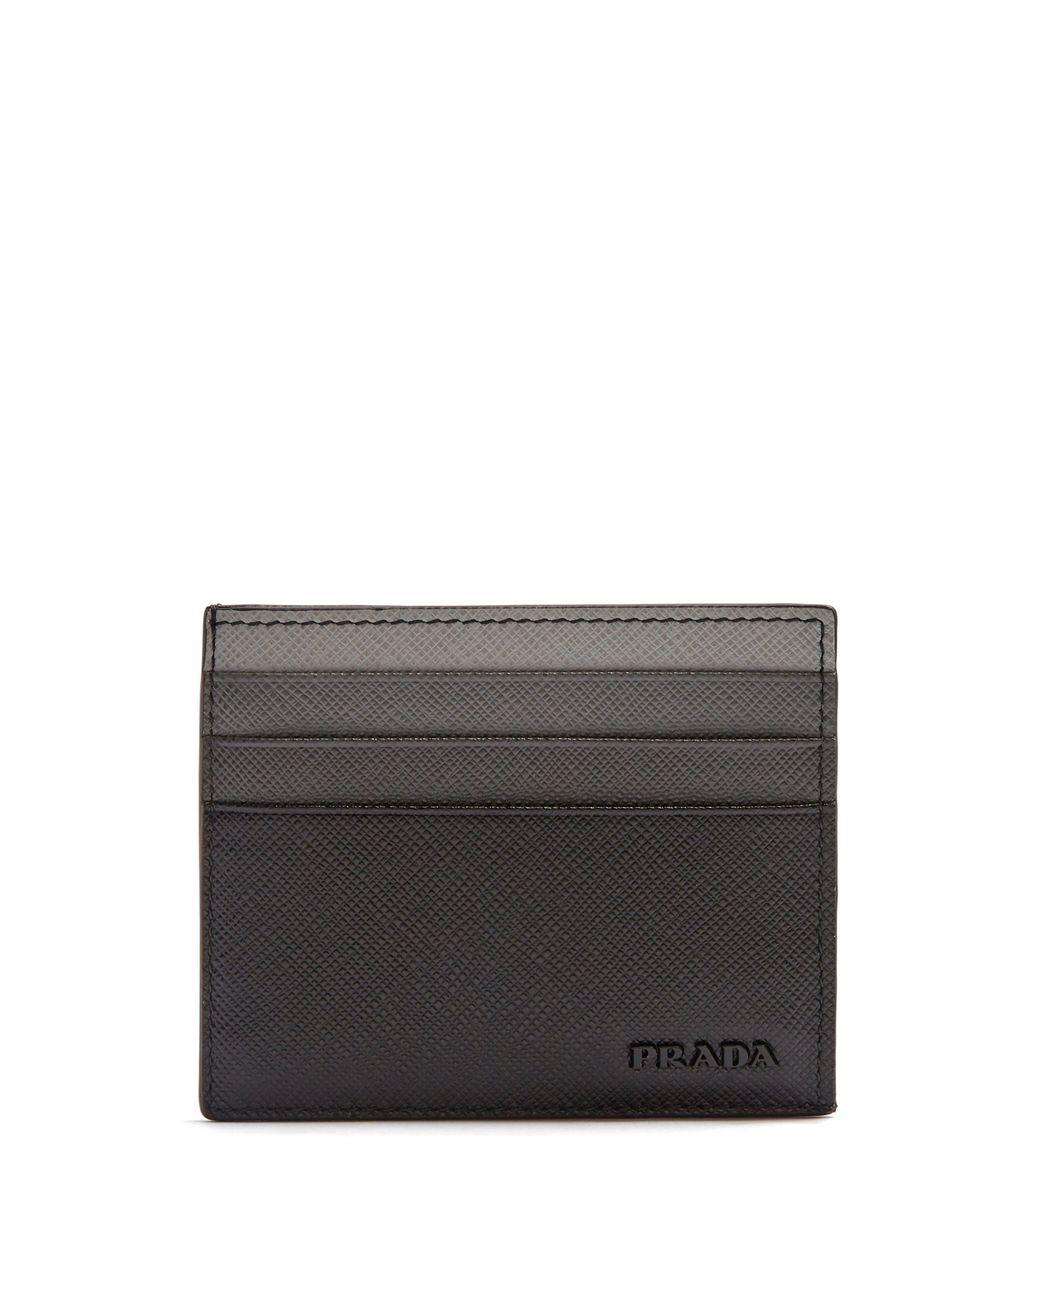 cdd38d52659 Prada Saffiano Leather Cardholder in Black for Men - Lyst